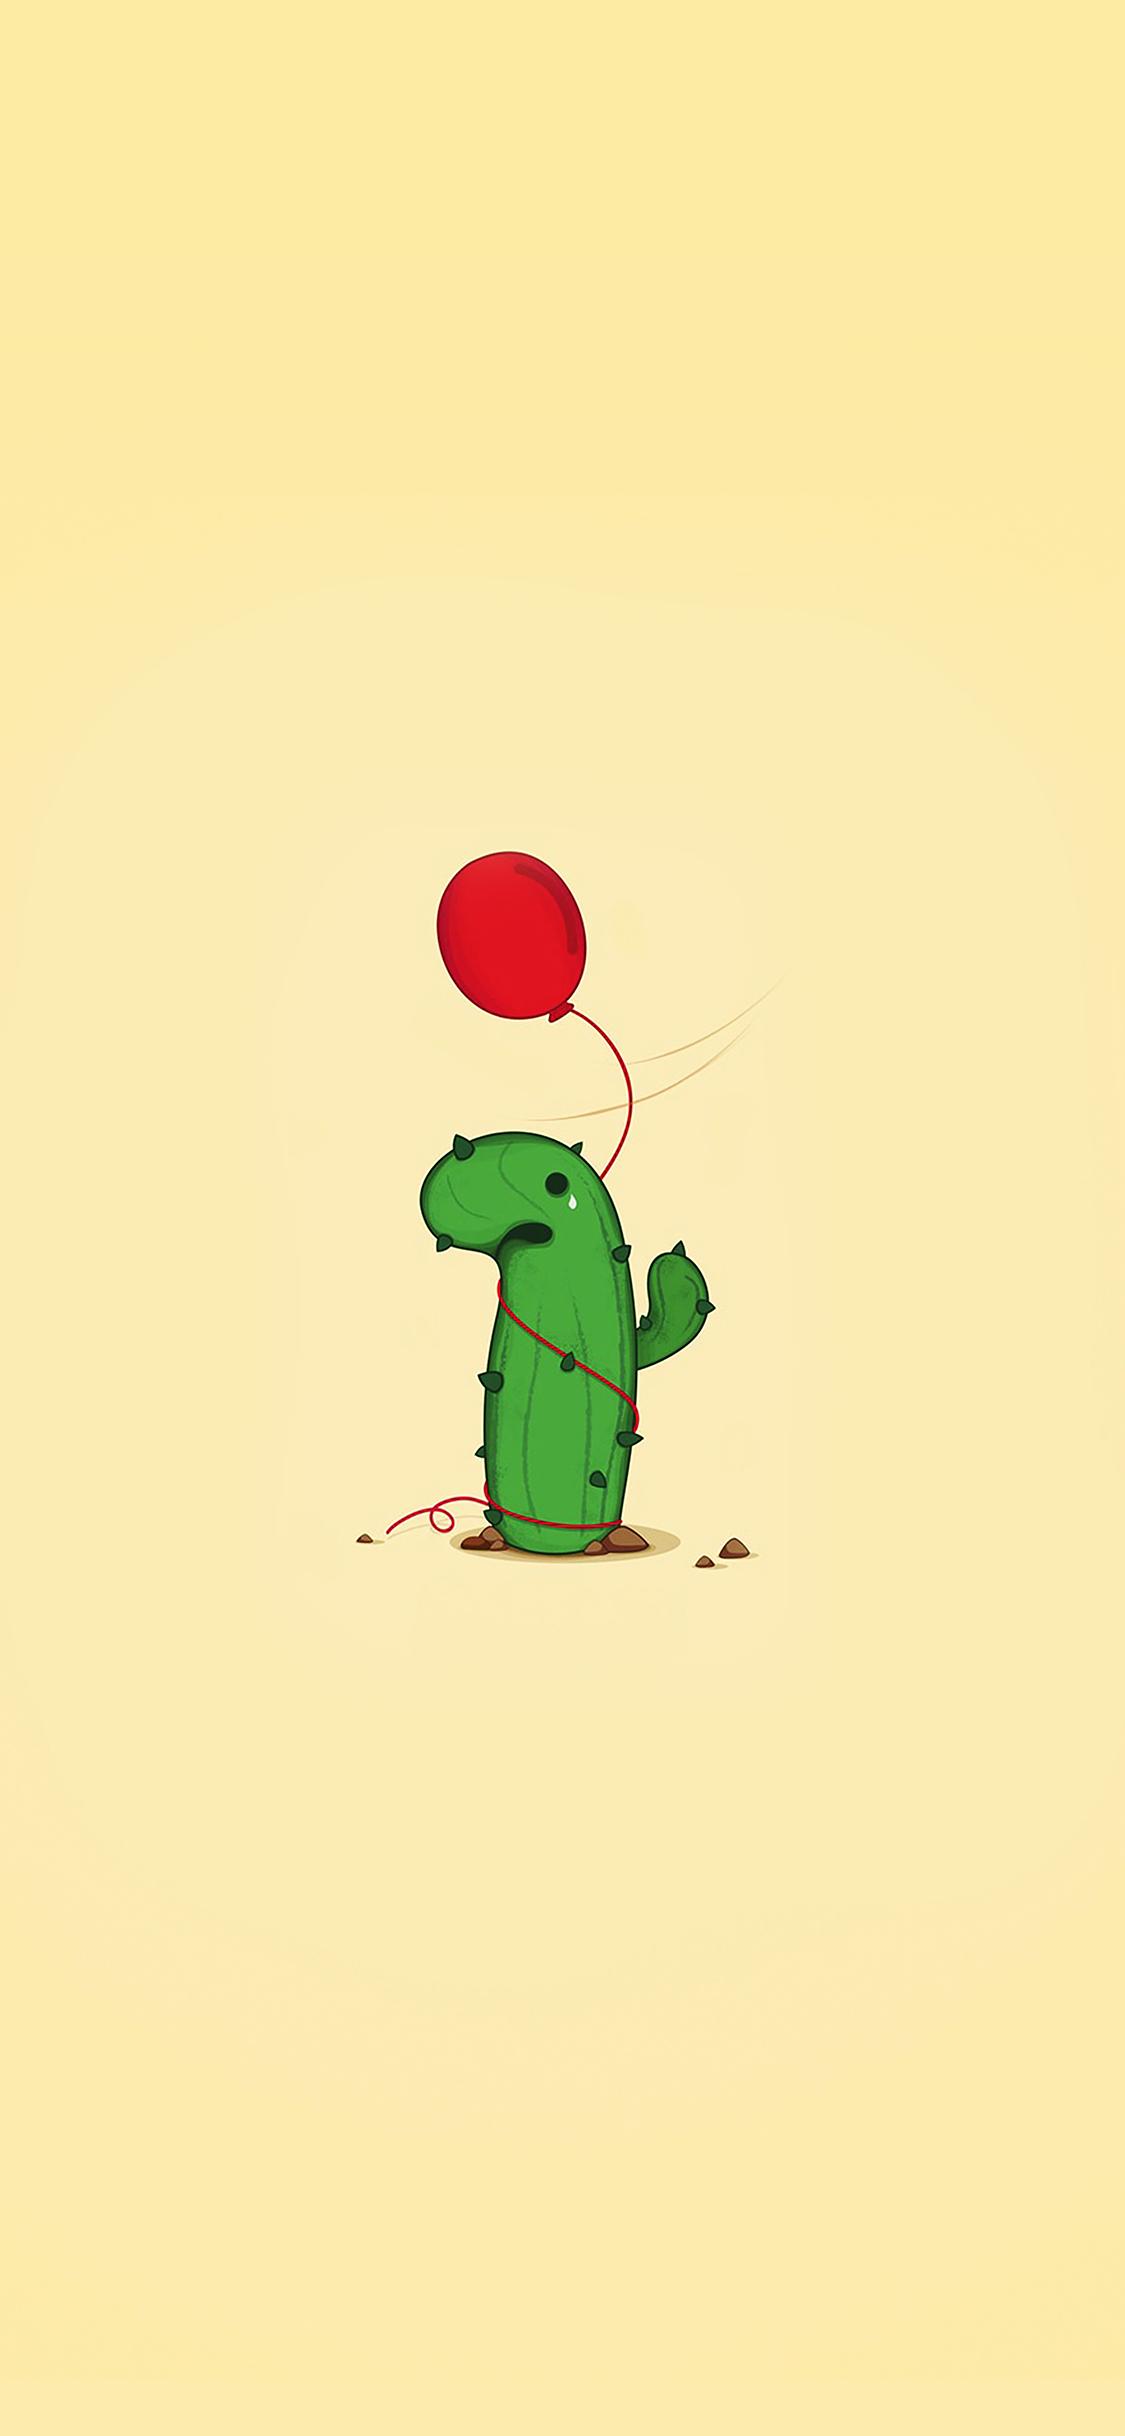 Ai35 Cute Cactus Ballon Illust Art Minimal Papers Co